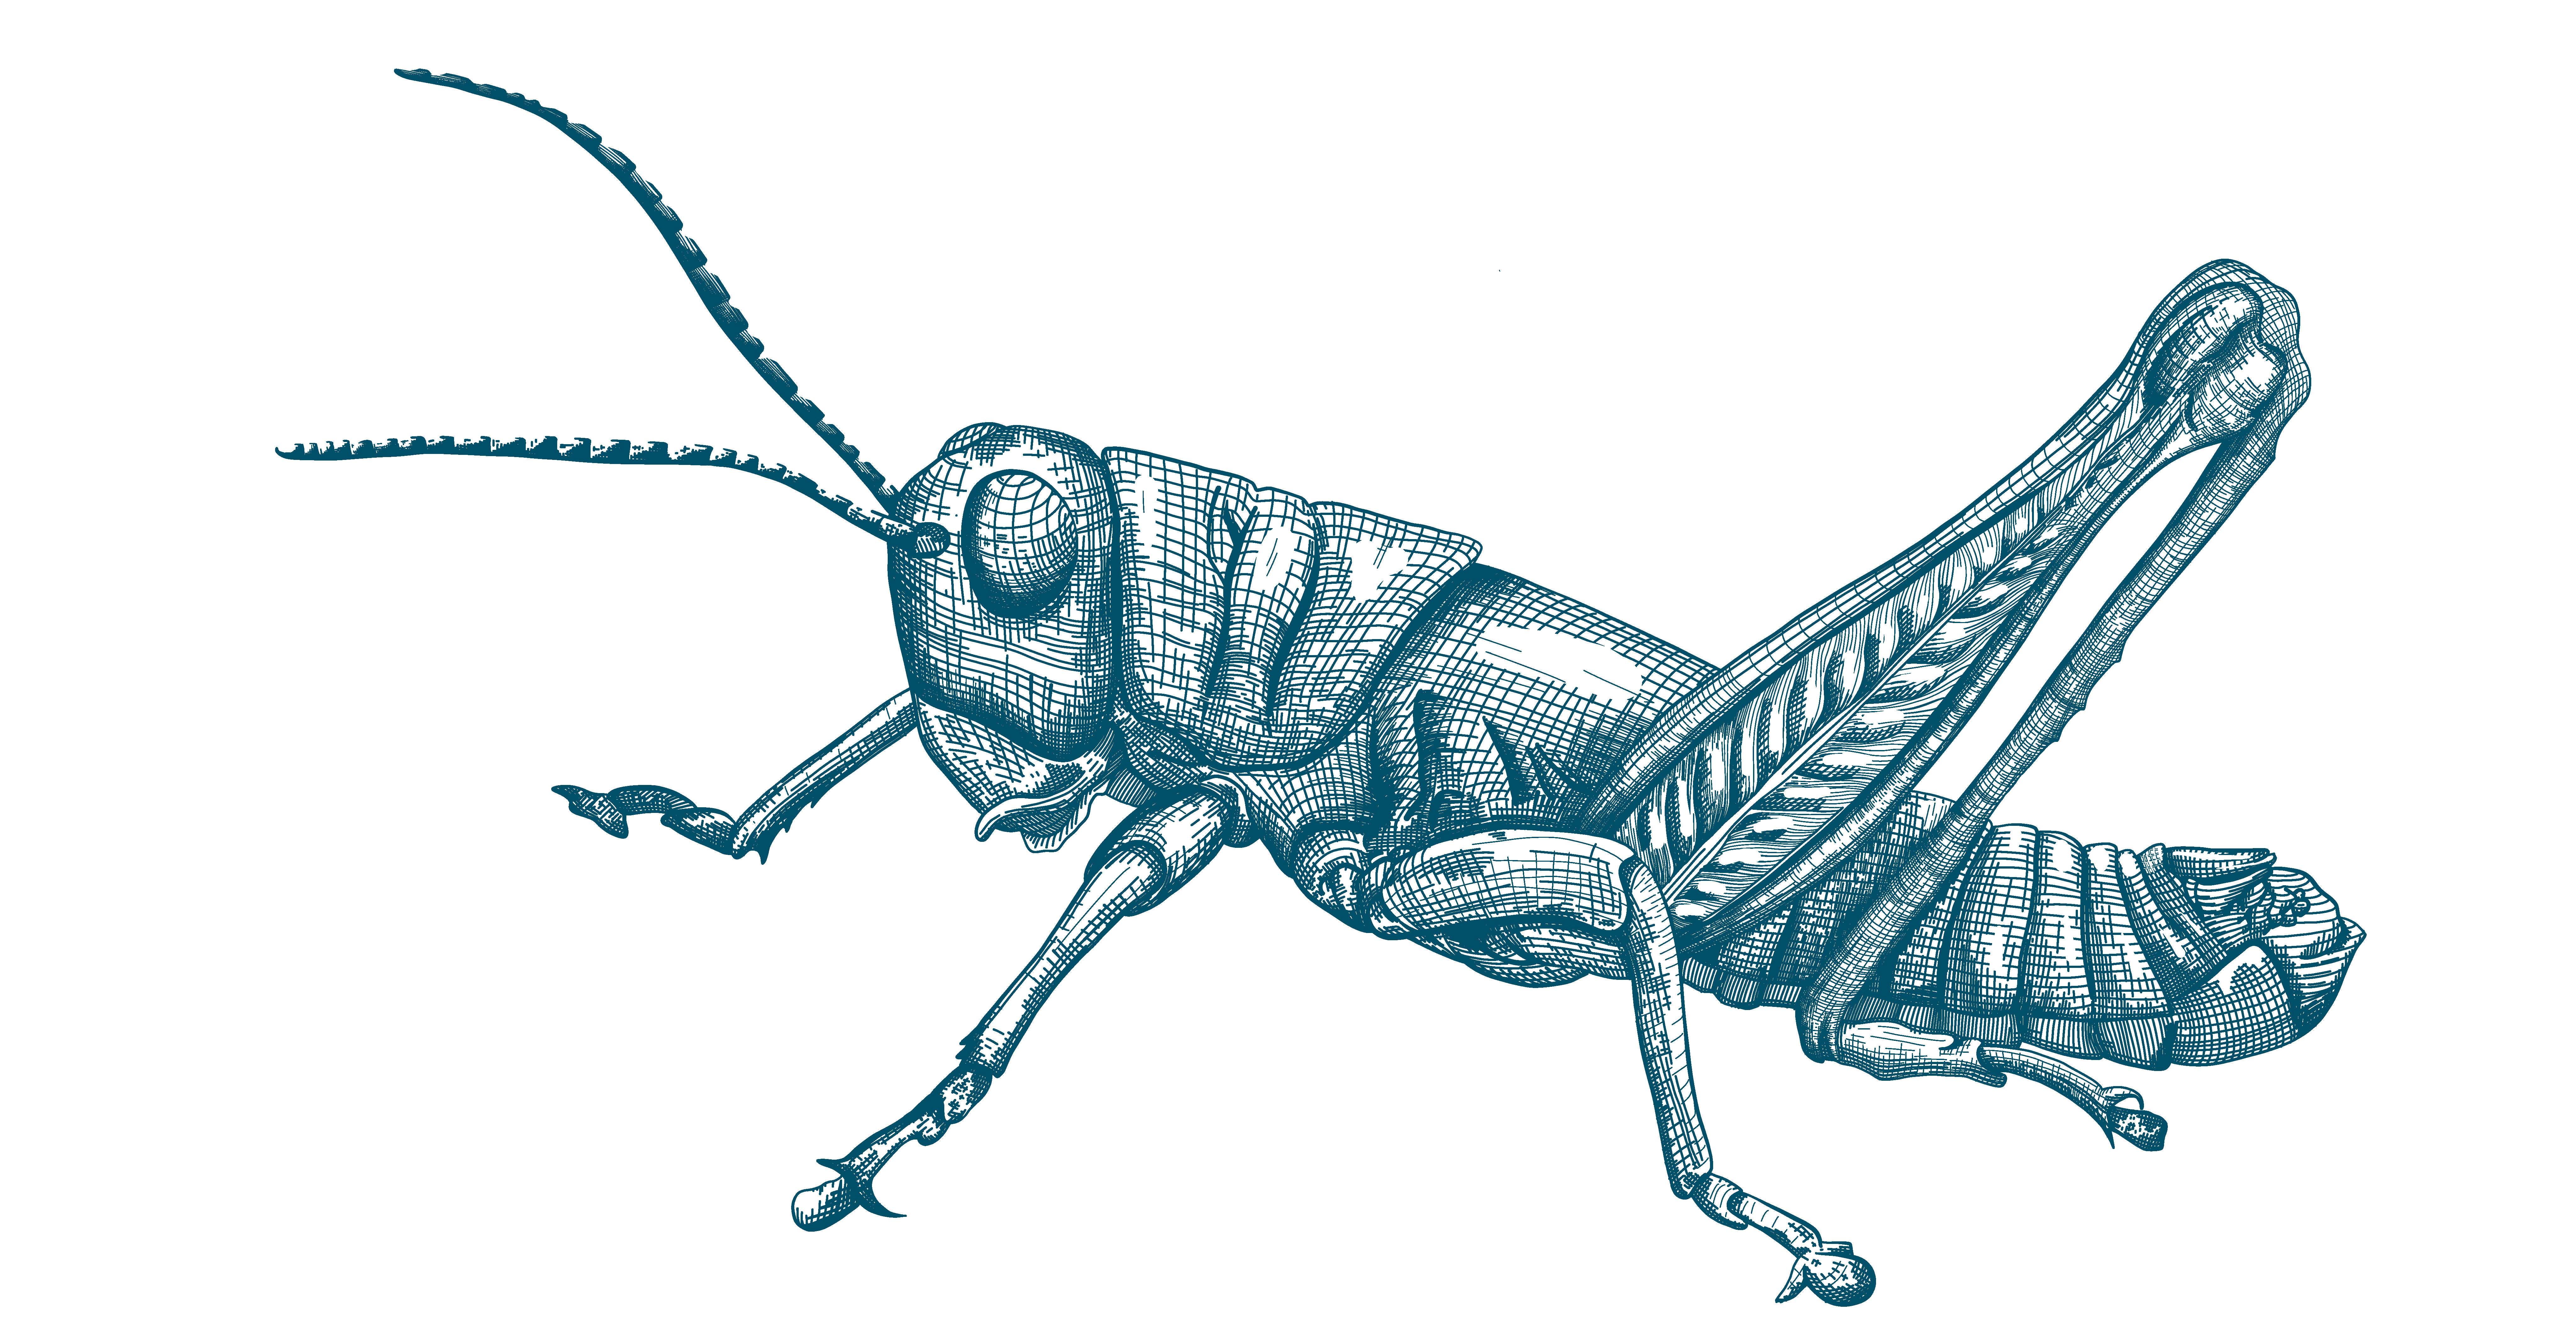 Fuzzy Olive Green Olive-green grasshopper insect blackbelt prairie garden